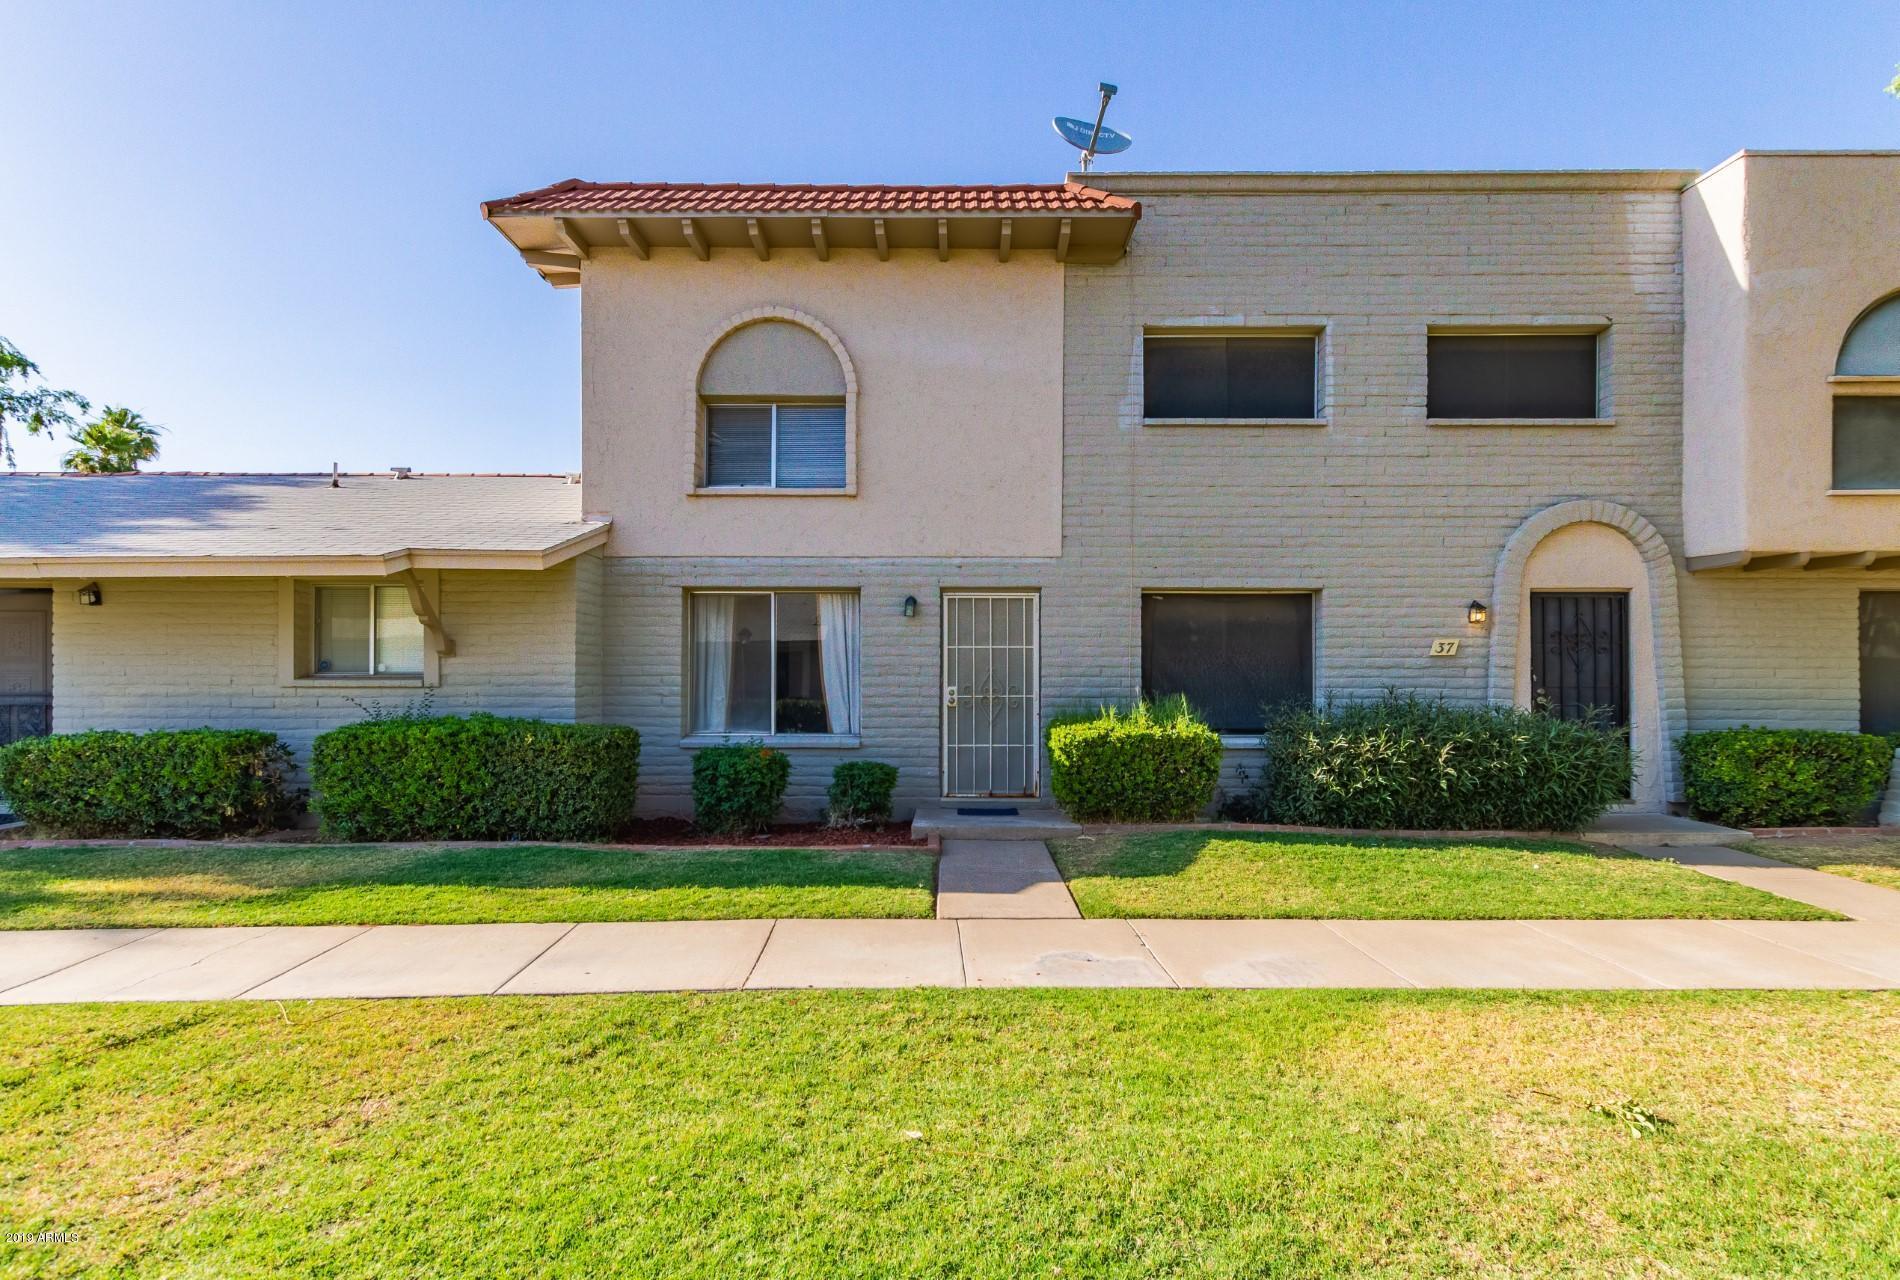 Photo of 225 N STANDAGE Street #36, Mesa, AZ 85201